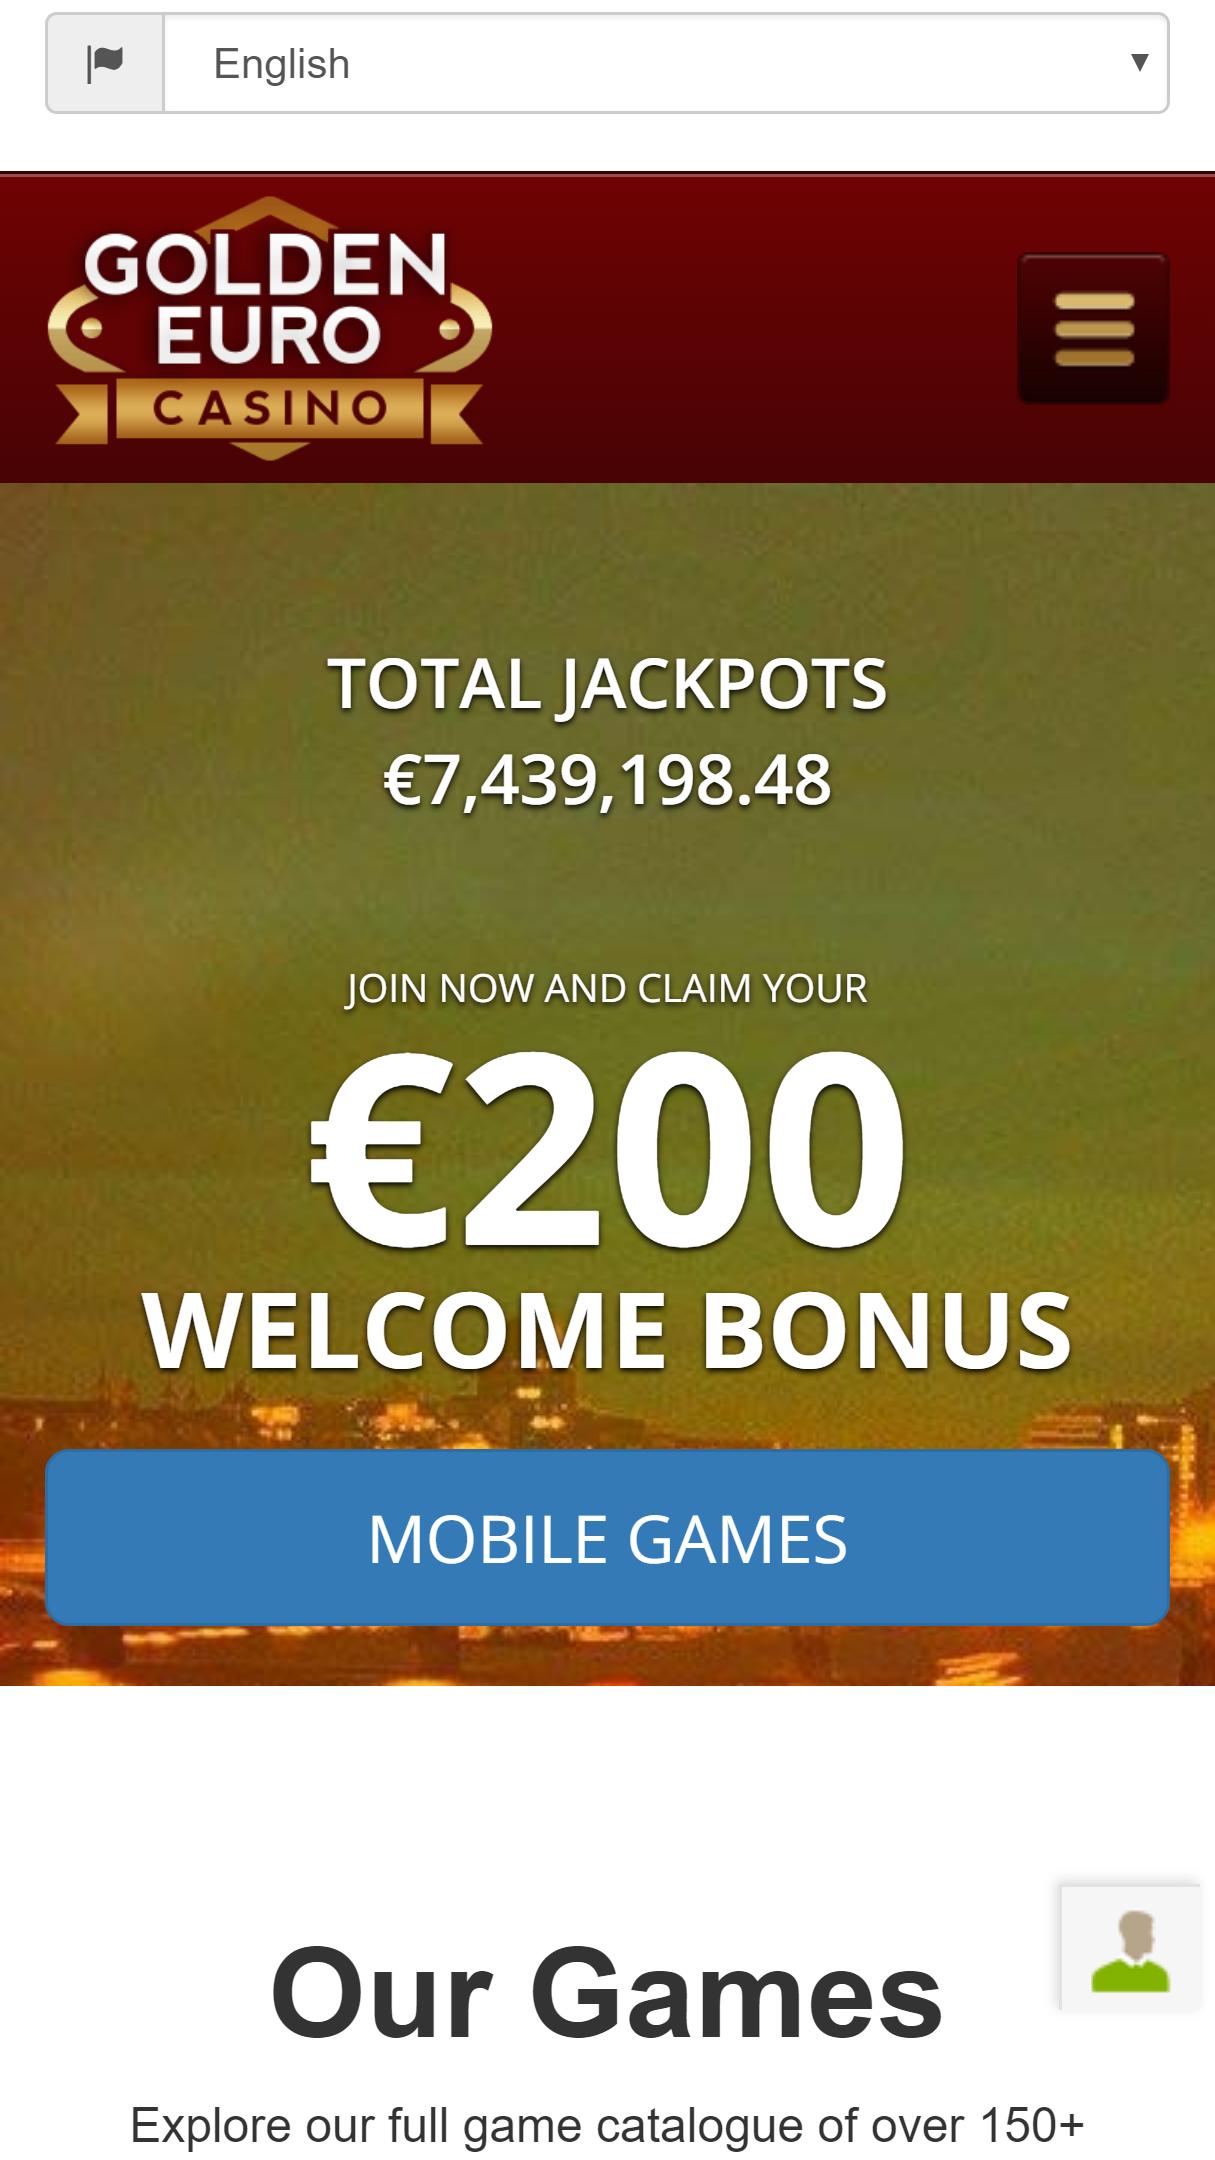 Golden Euro Casino App Homepage